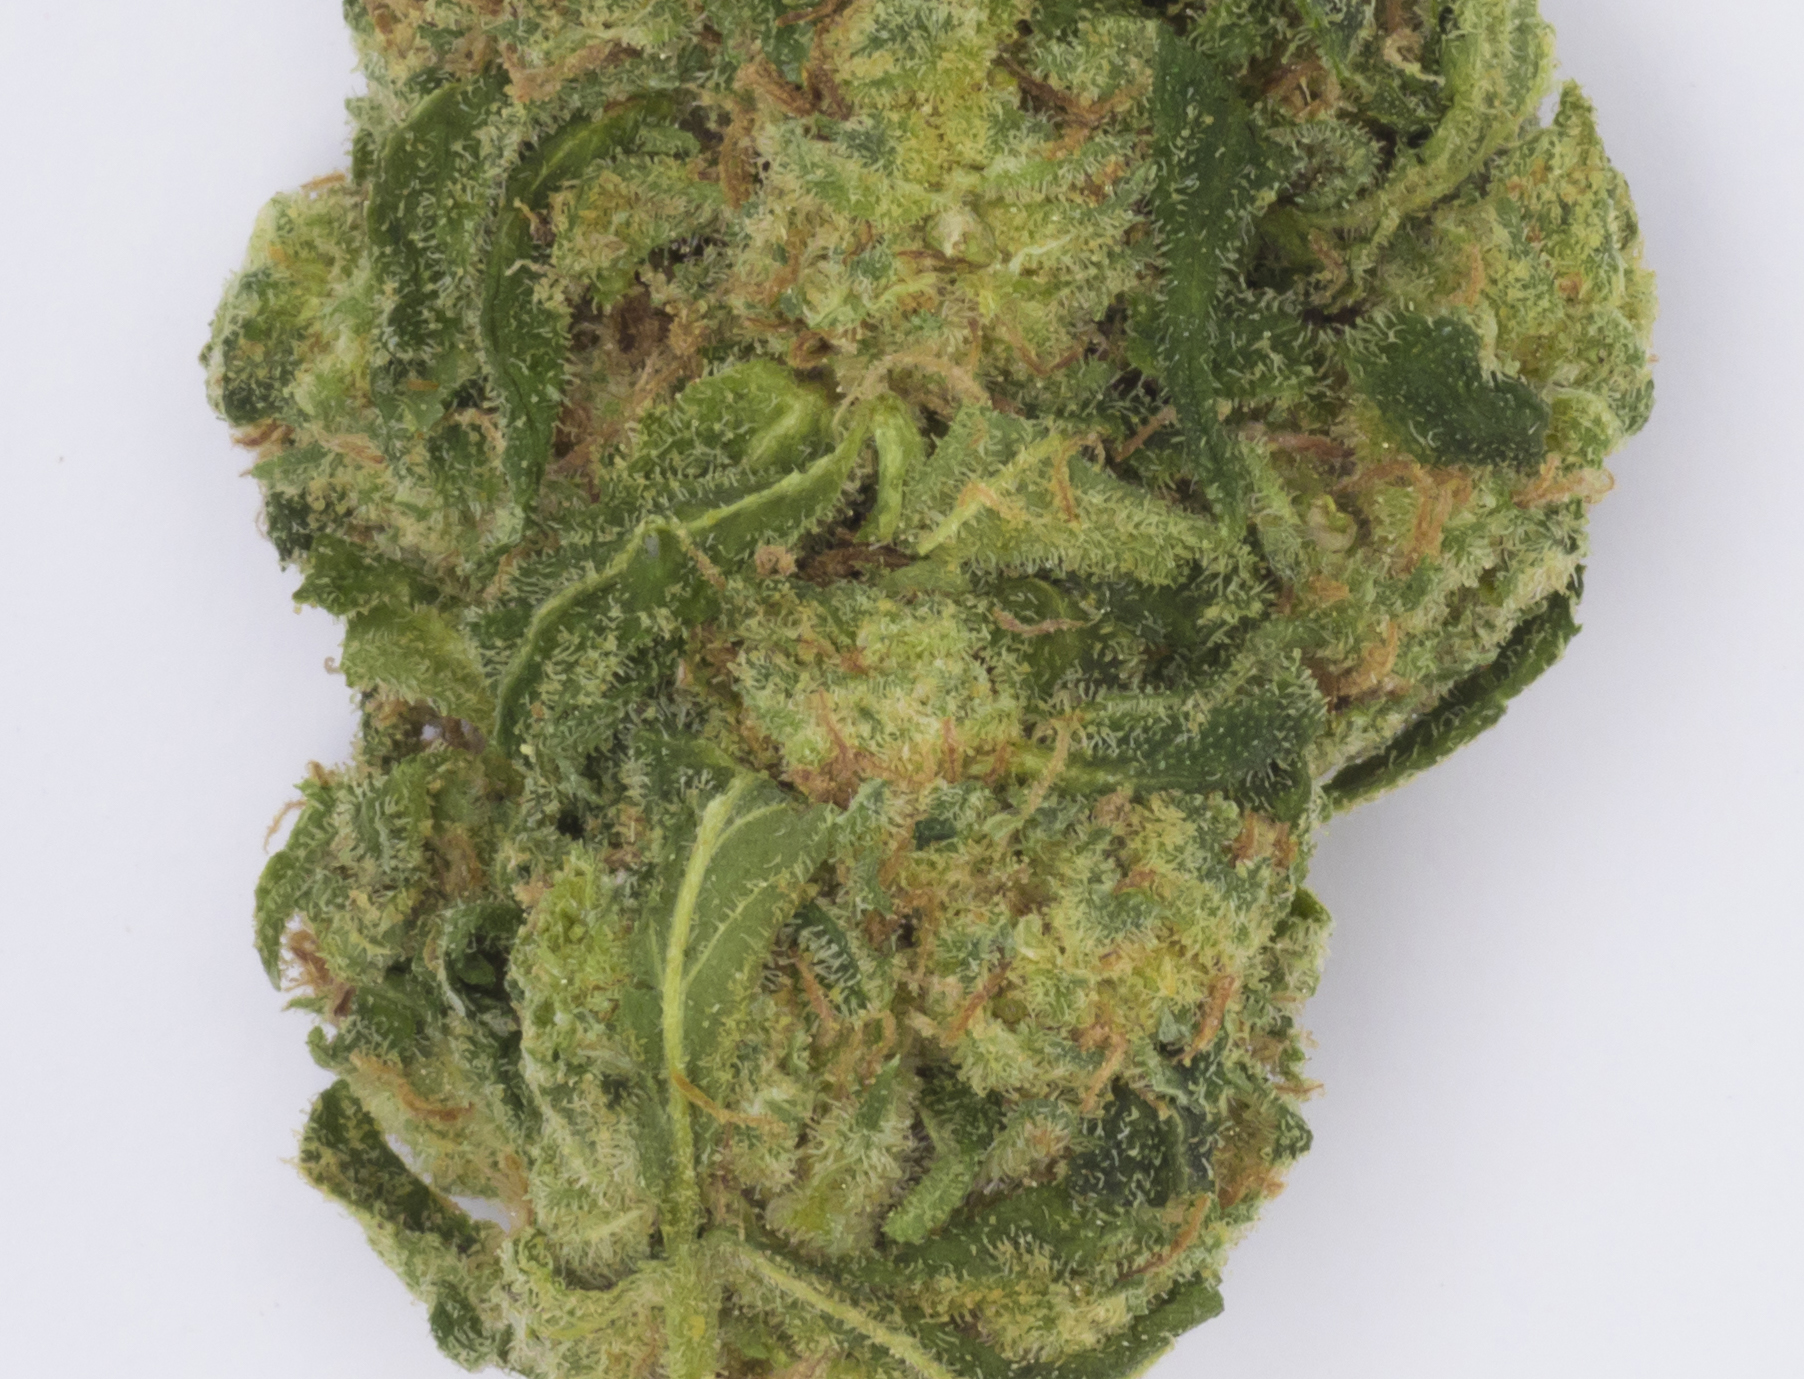 Cannabis002101A2064 copy.jpg